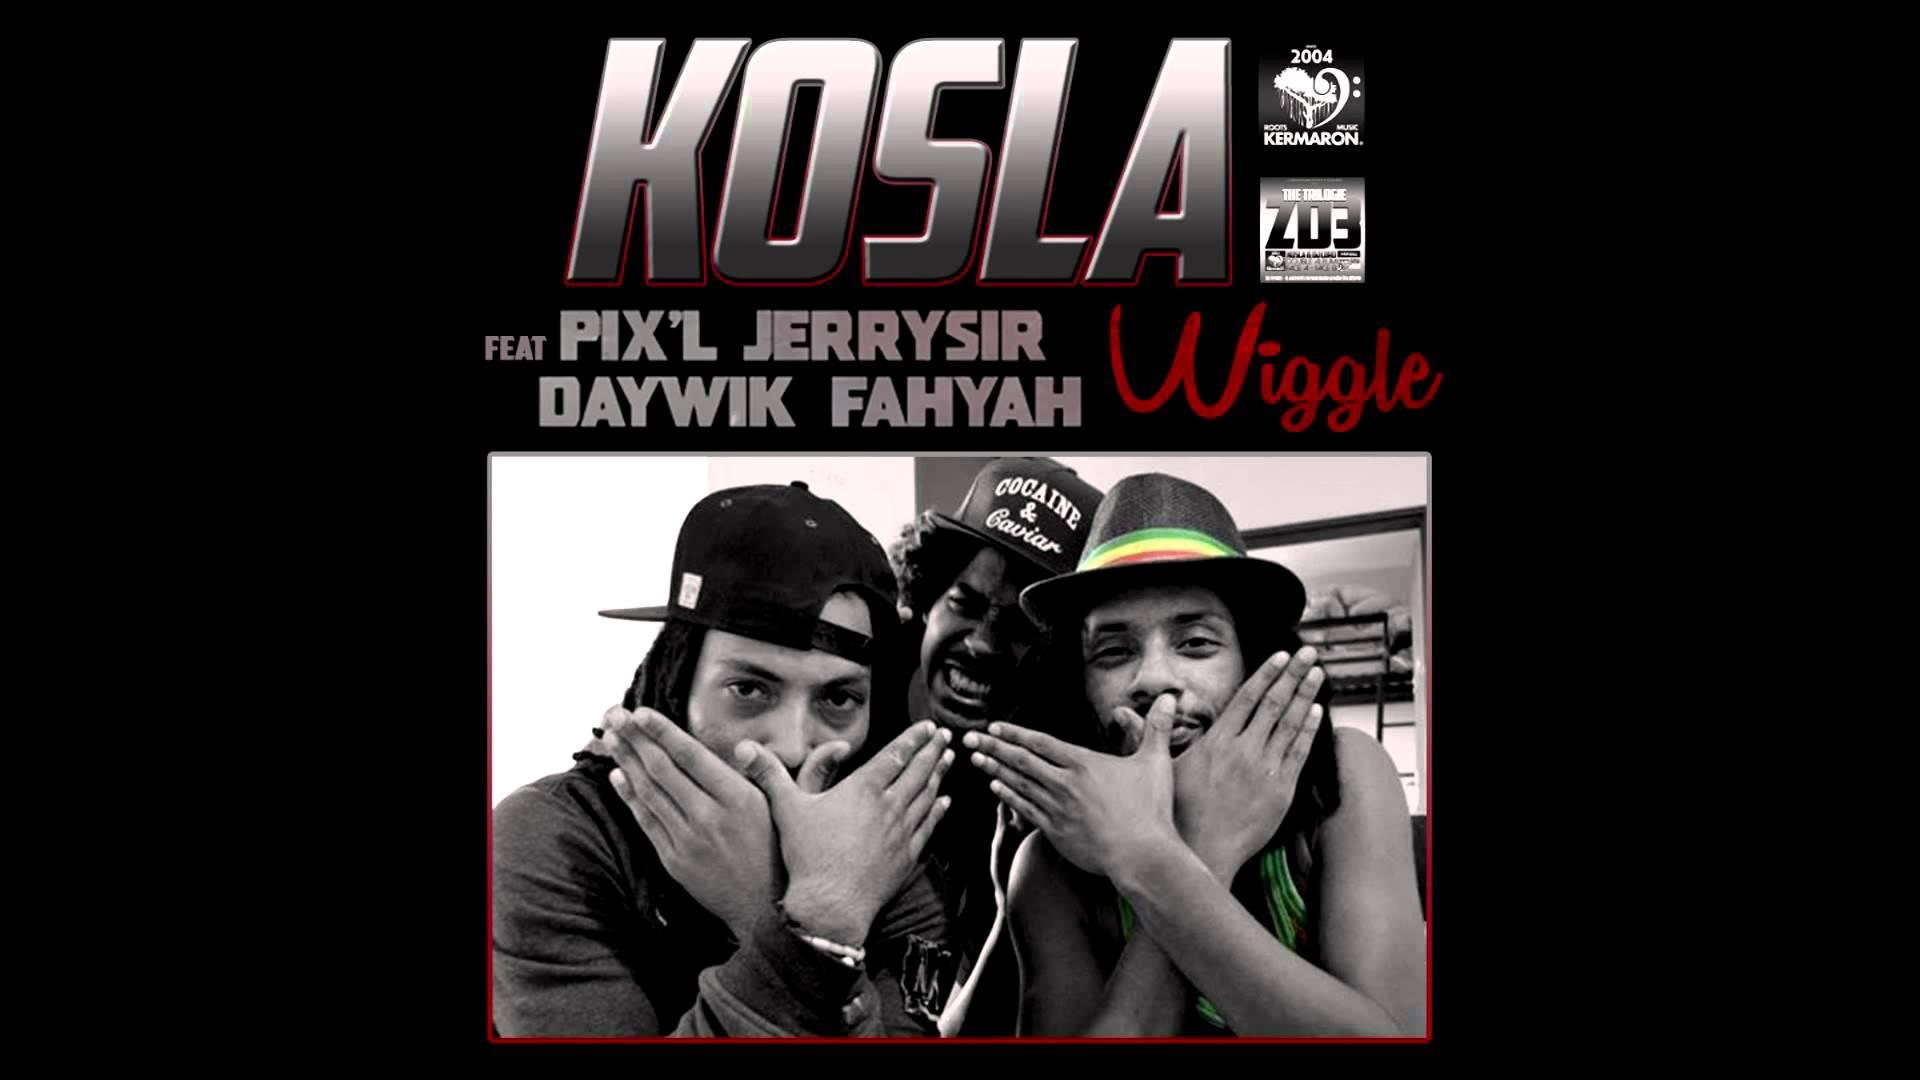 WIGGLE RMX – Kosla feat Pix'L, Daywik Fahyah & Jerry Sir